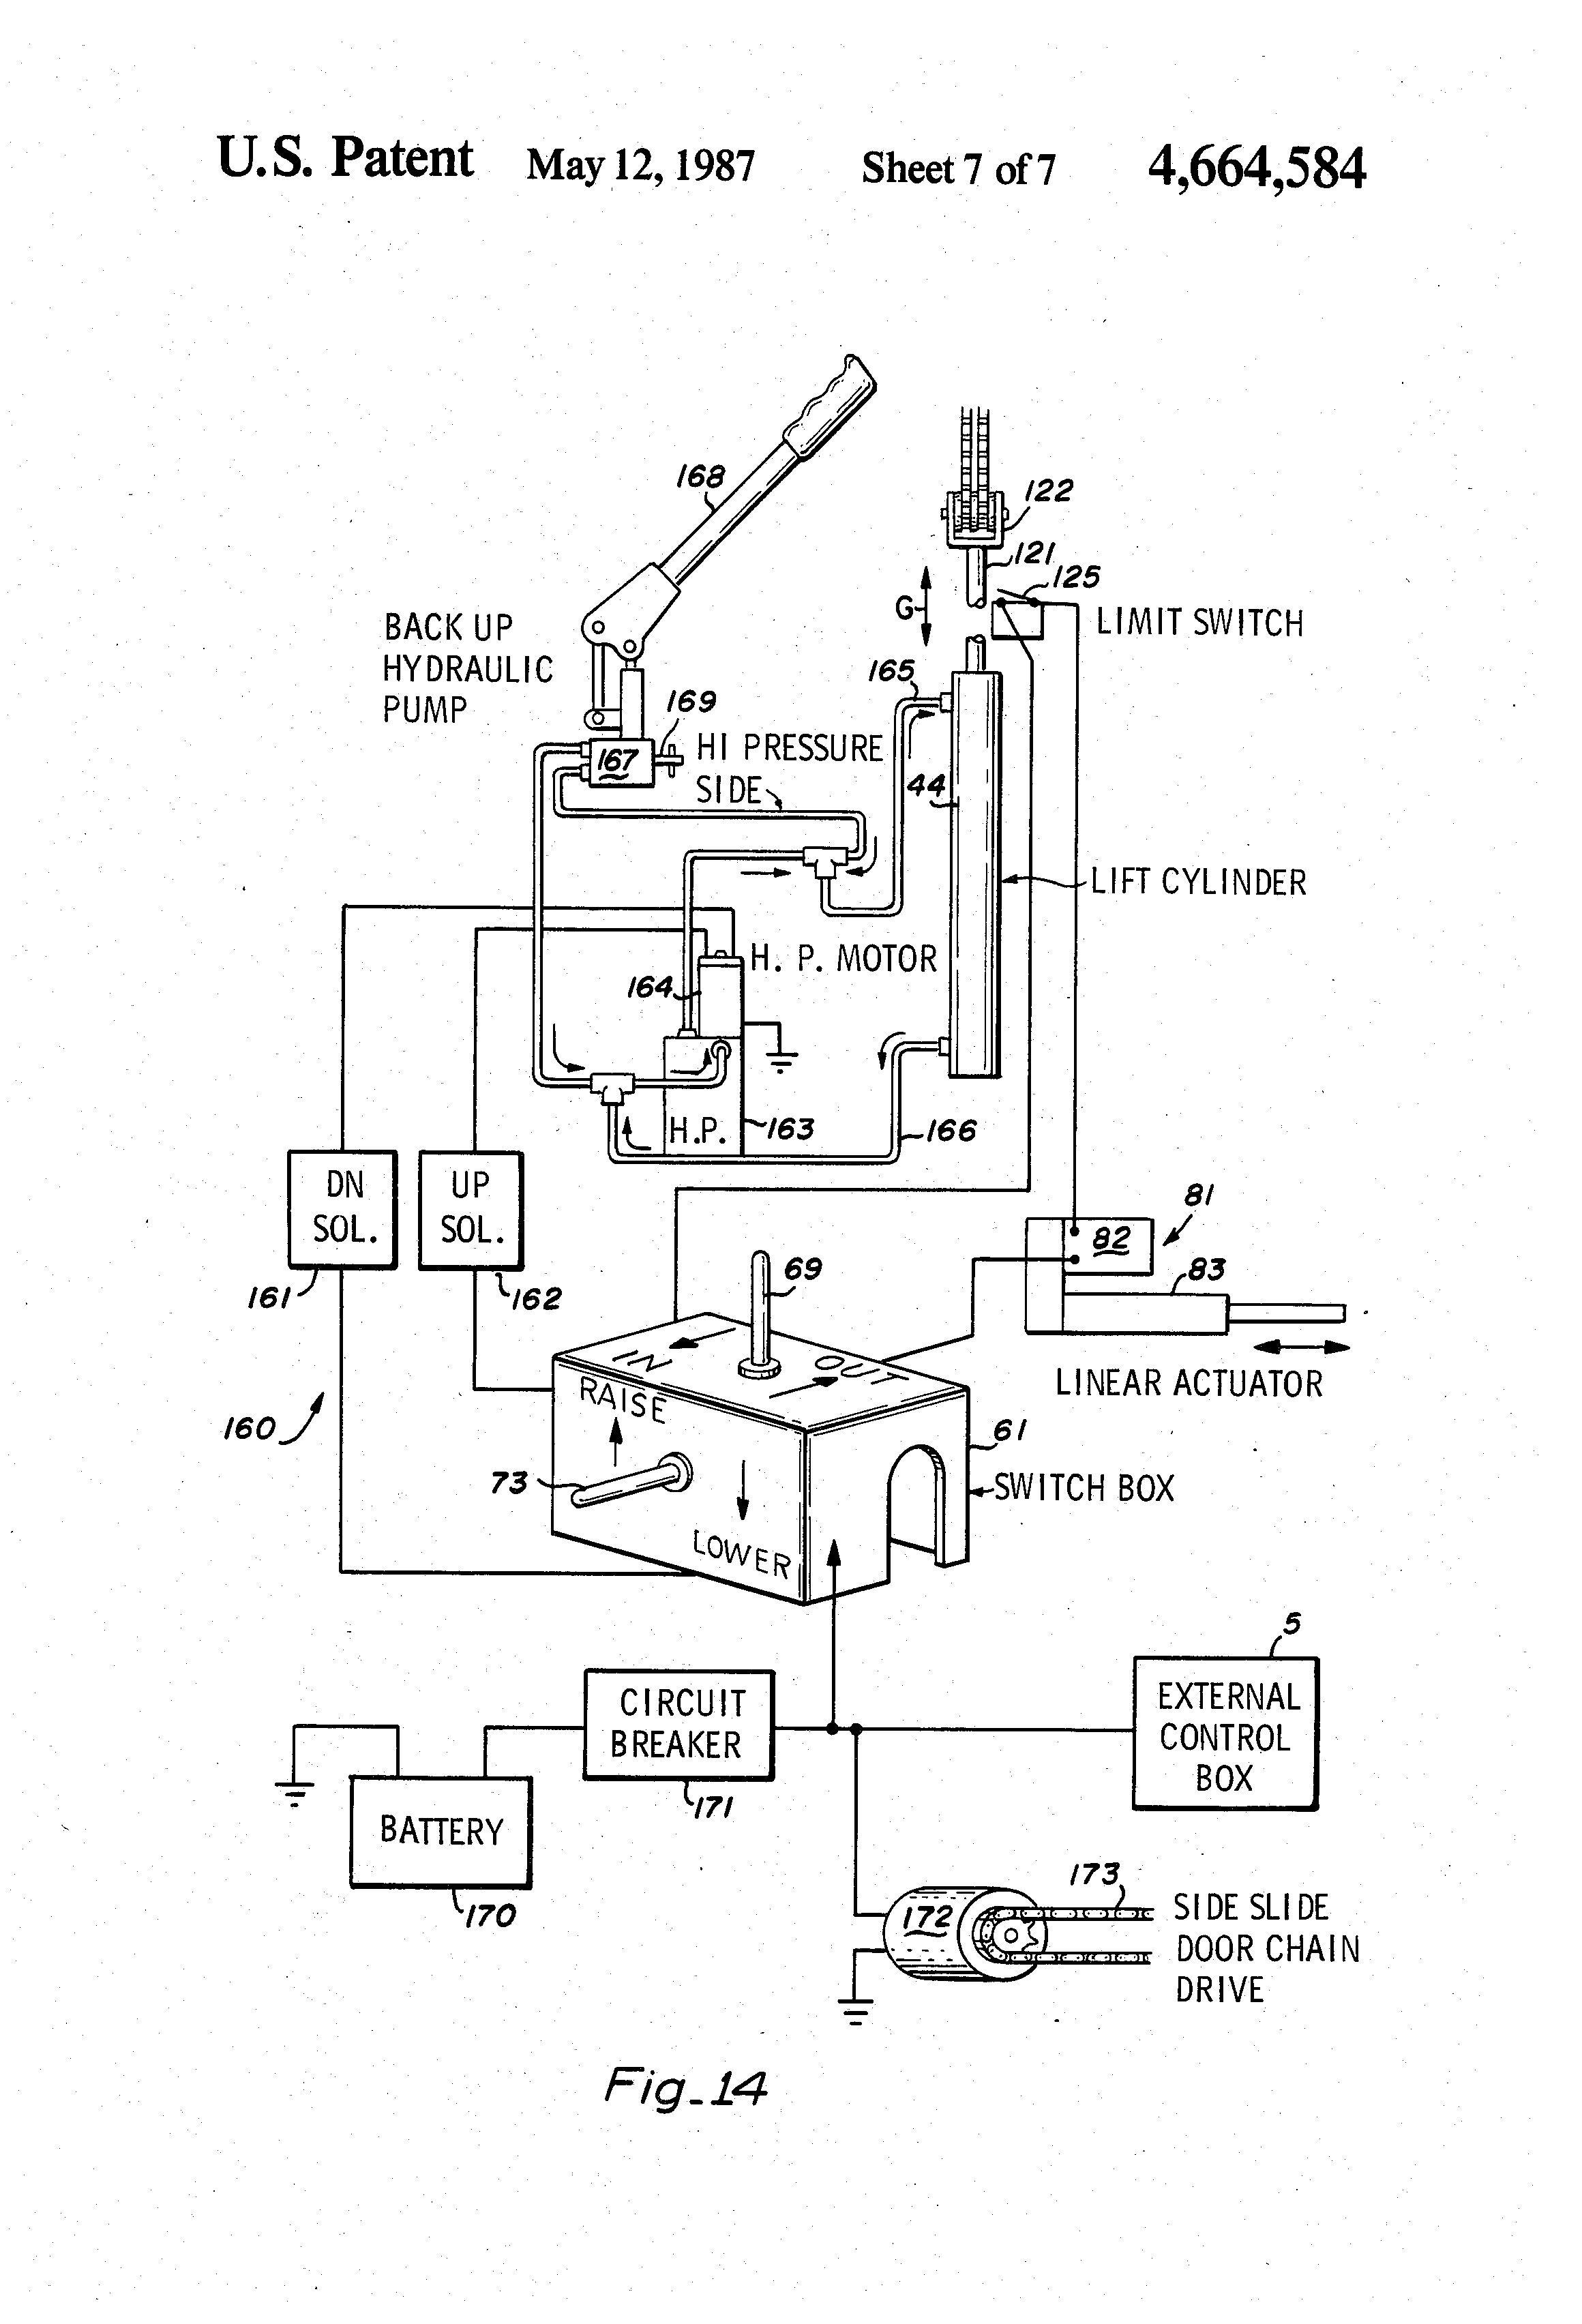 Inspirational Boat Wiring Diagram Sample Diagrams Digramssample Diagramimages Wiringdiagramsample Wiringdia Diagram Electrical Wiring Colours Scissor Lift